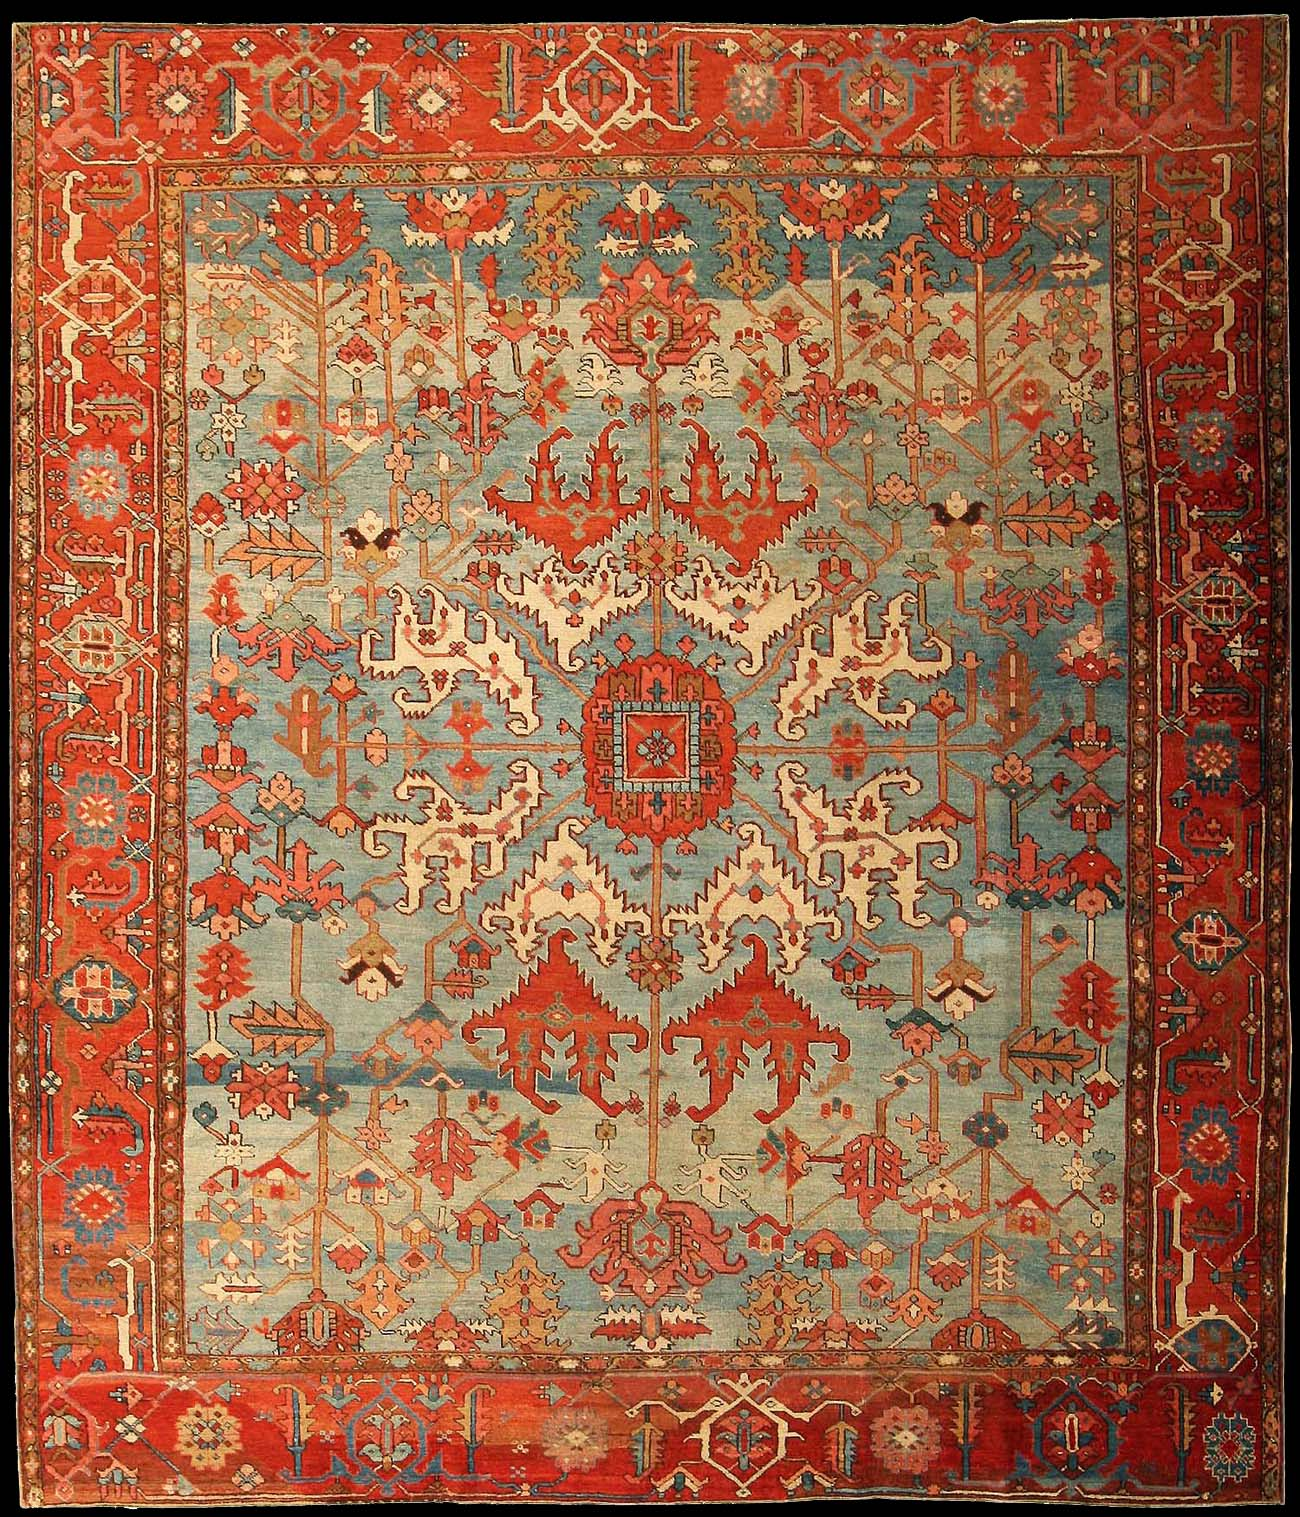 Antique Serapi Rug Azerbaijan Nw Iran Late 19th Century 10 X 11 6